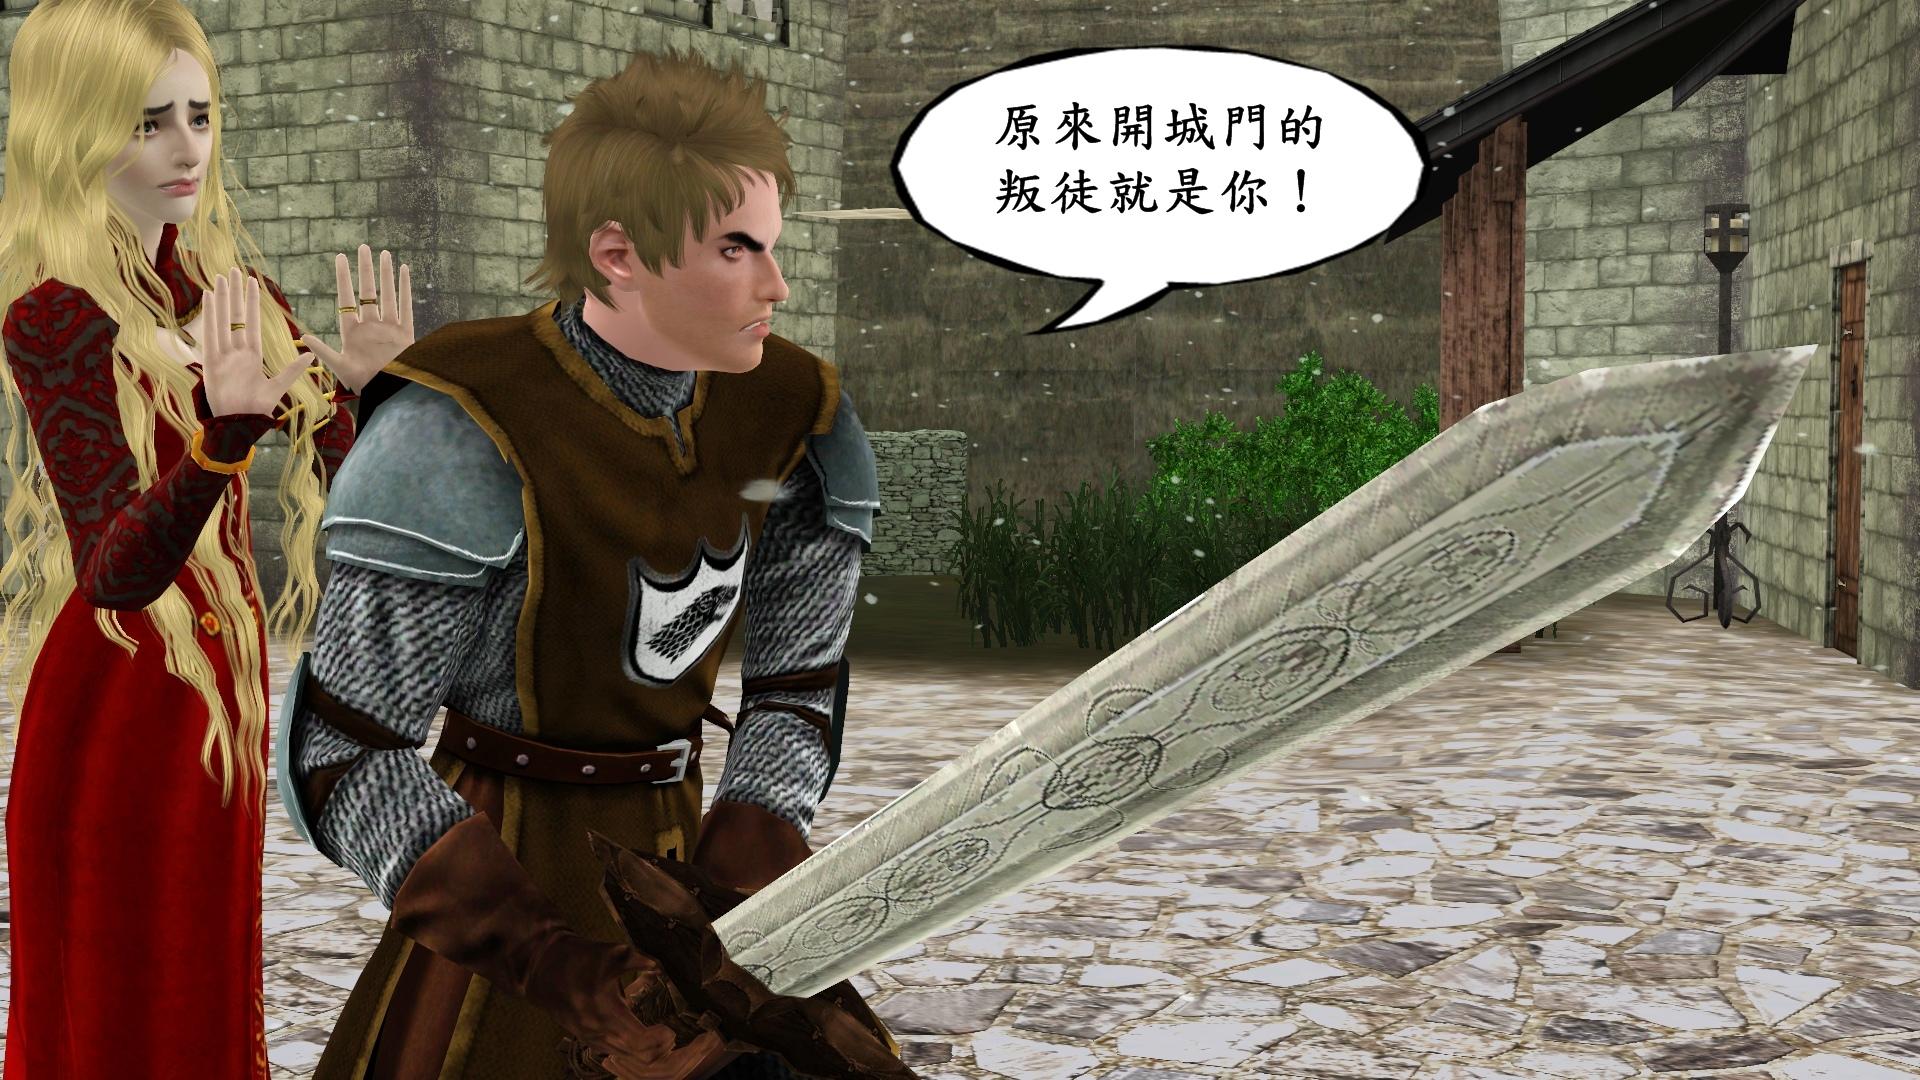 A09原來開城門的叛徒就是你!.jpg